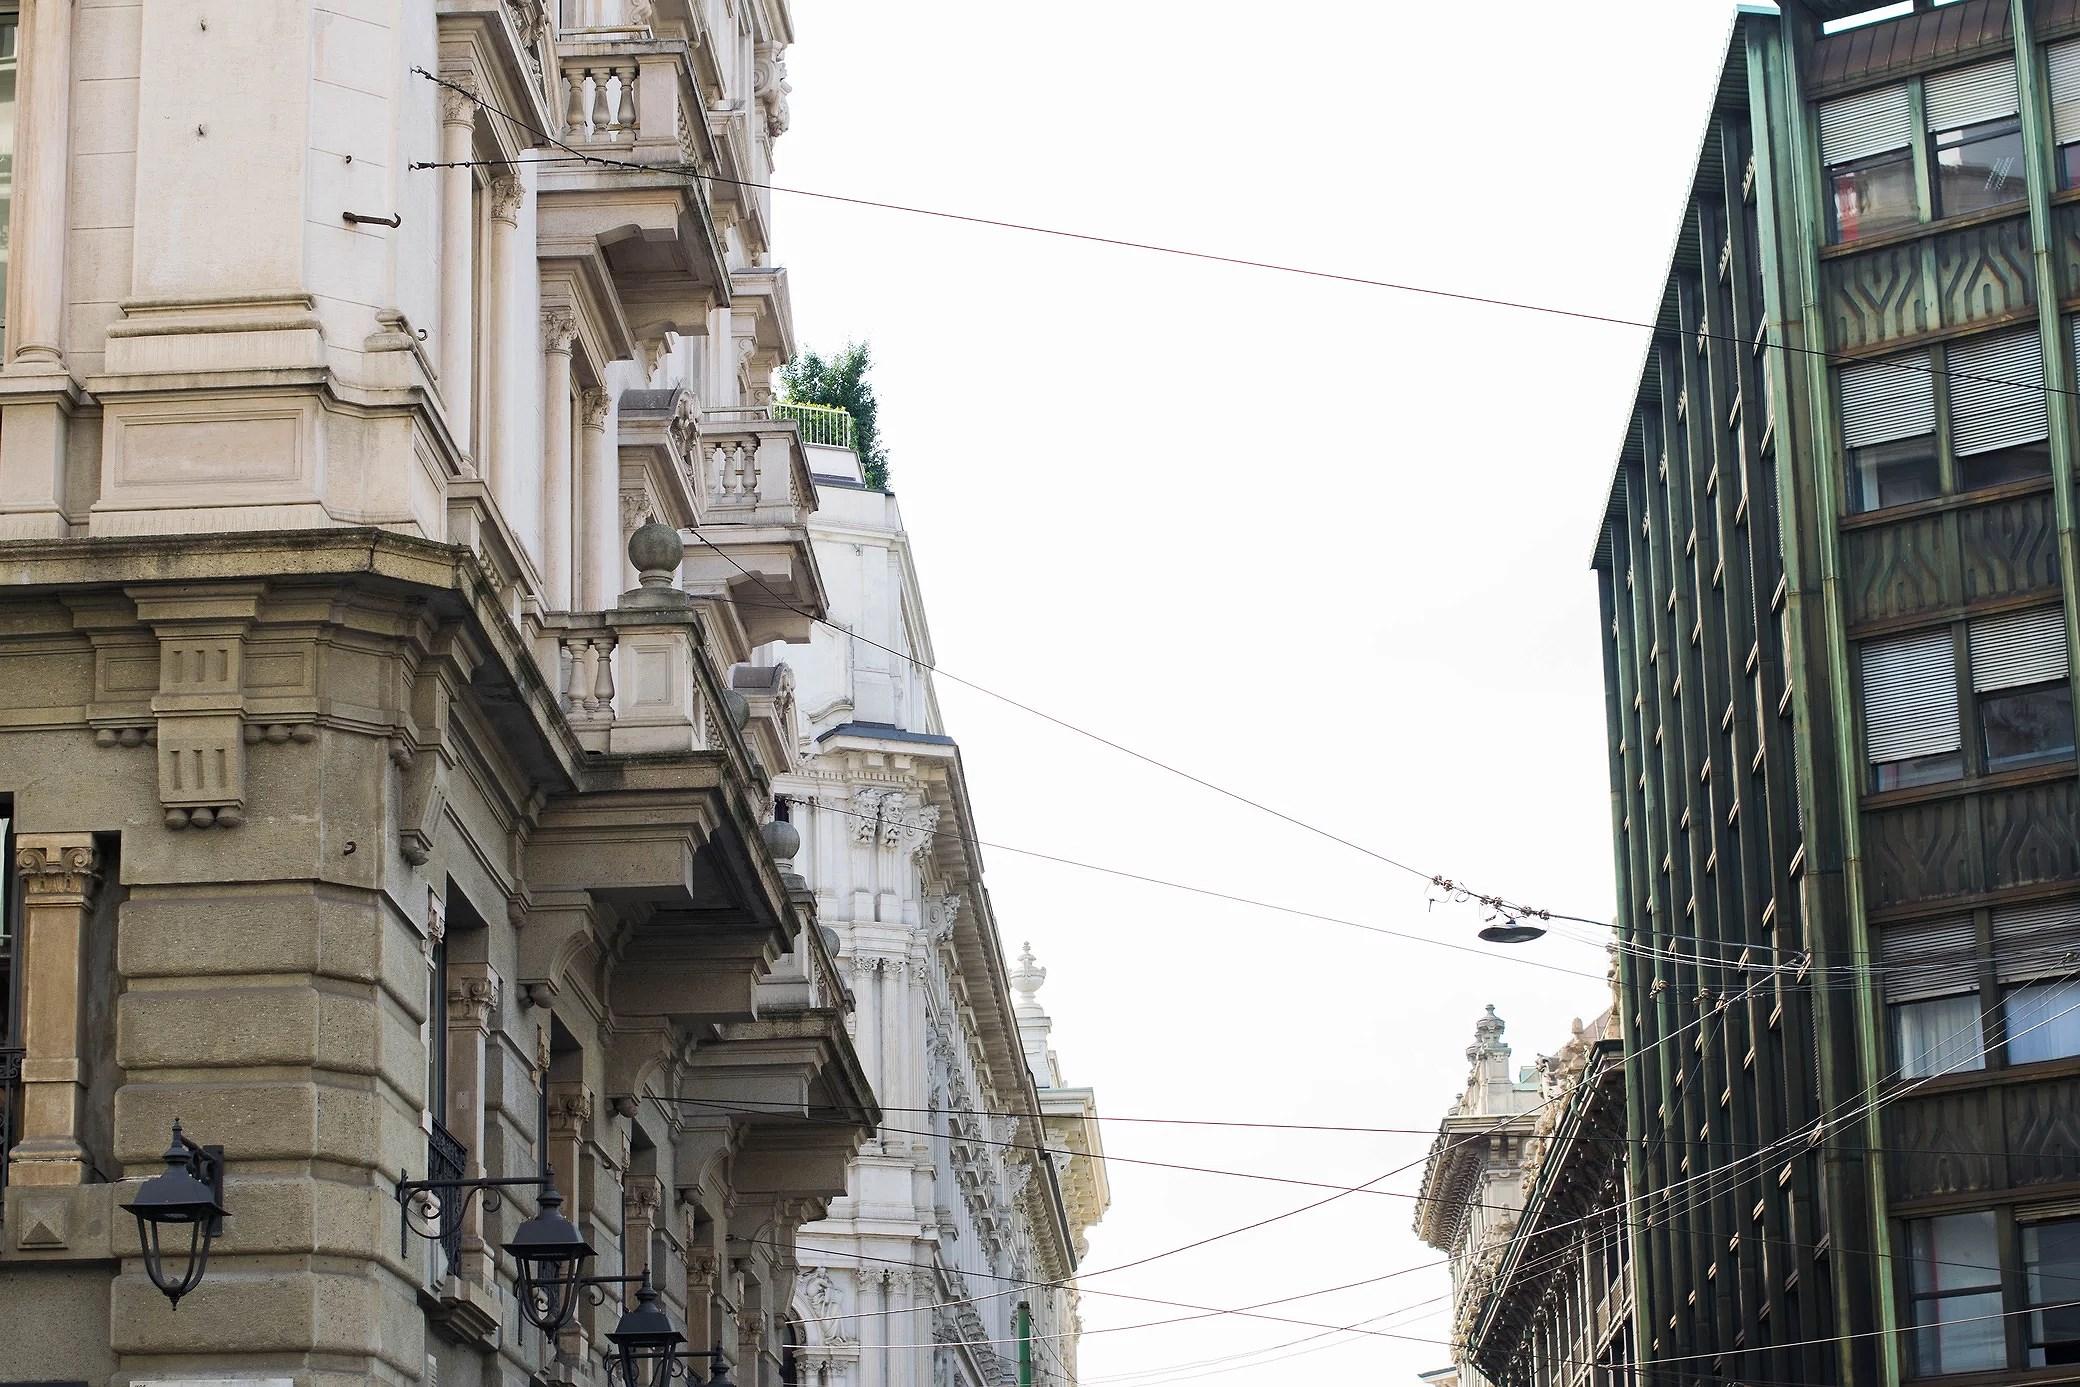 SNAPSHOTS FROM MILANO